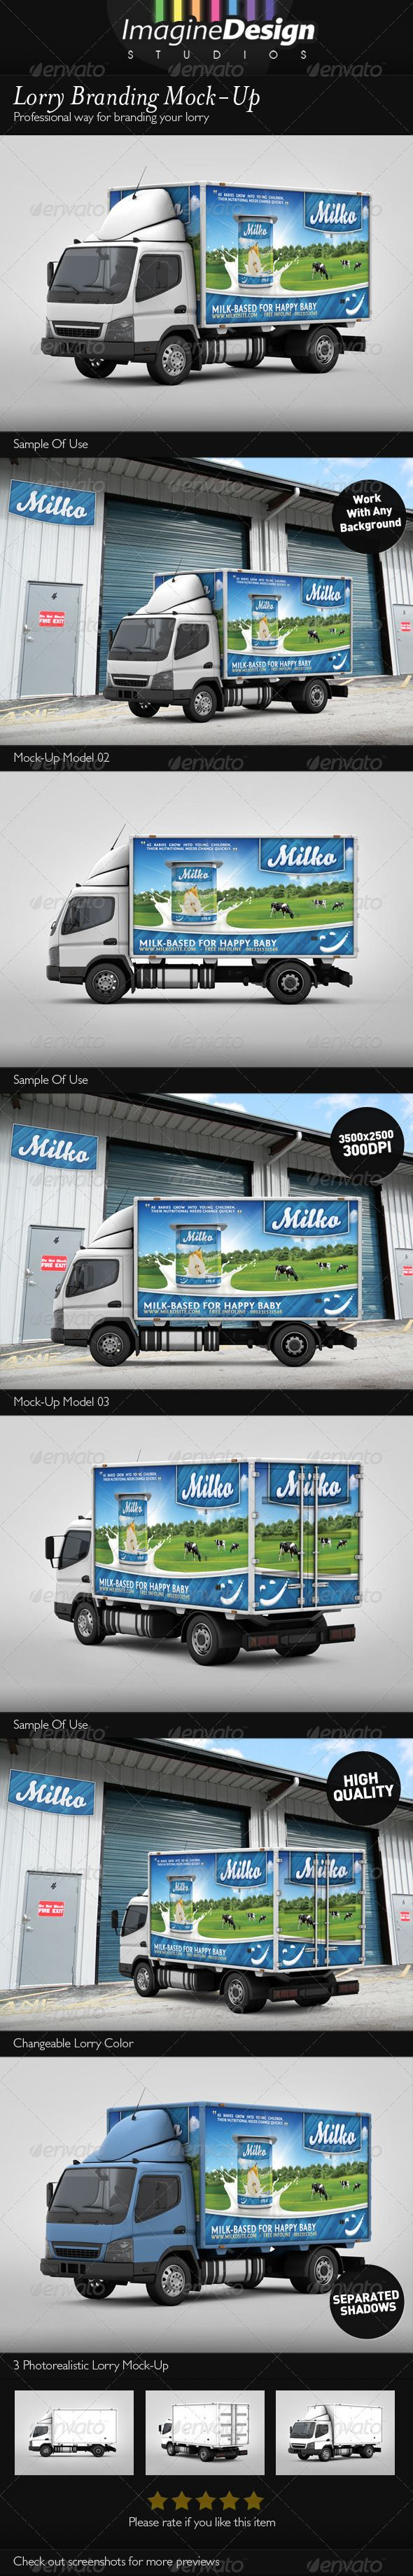 Lorry Branding Mock-Up Download here: https://graphicriver.net/item/lorry-branding-mockup/3315350?ref=KlitVogli